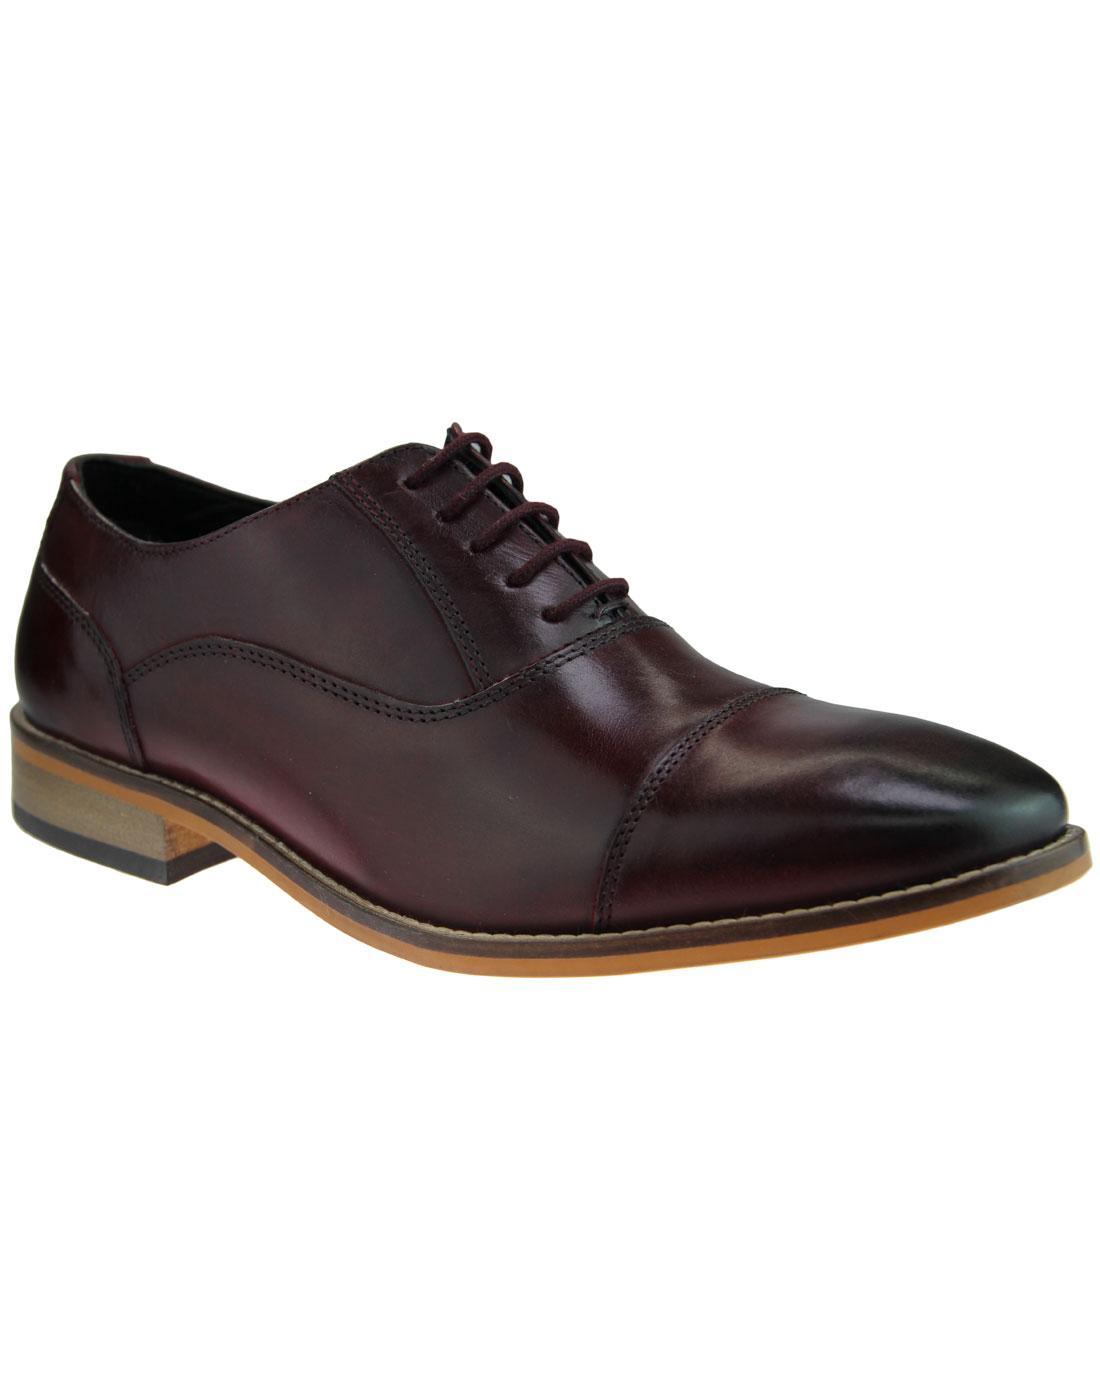 Toby IKON Retro Mod Toe Cap Oxford Shoes BORDO